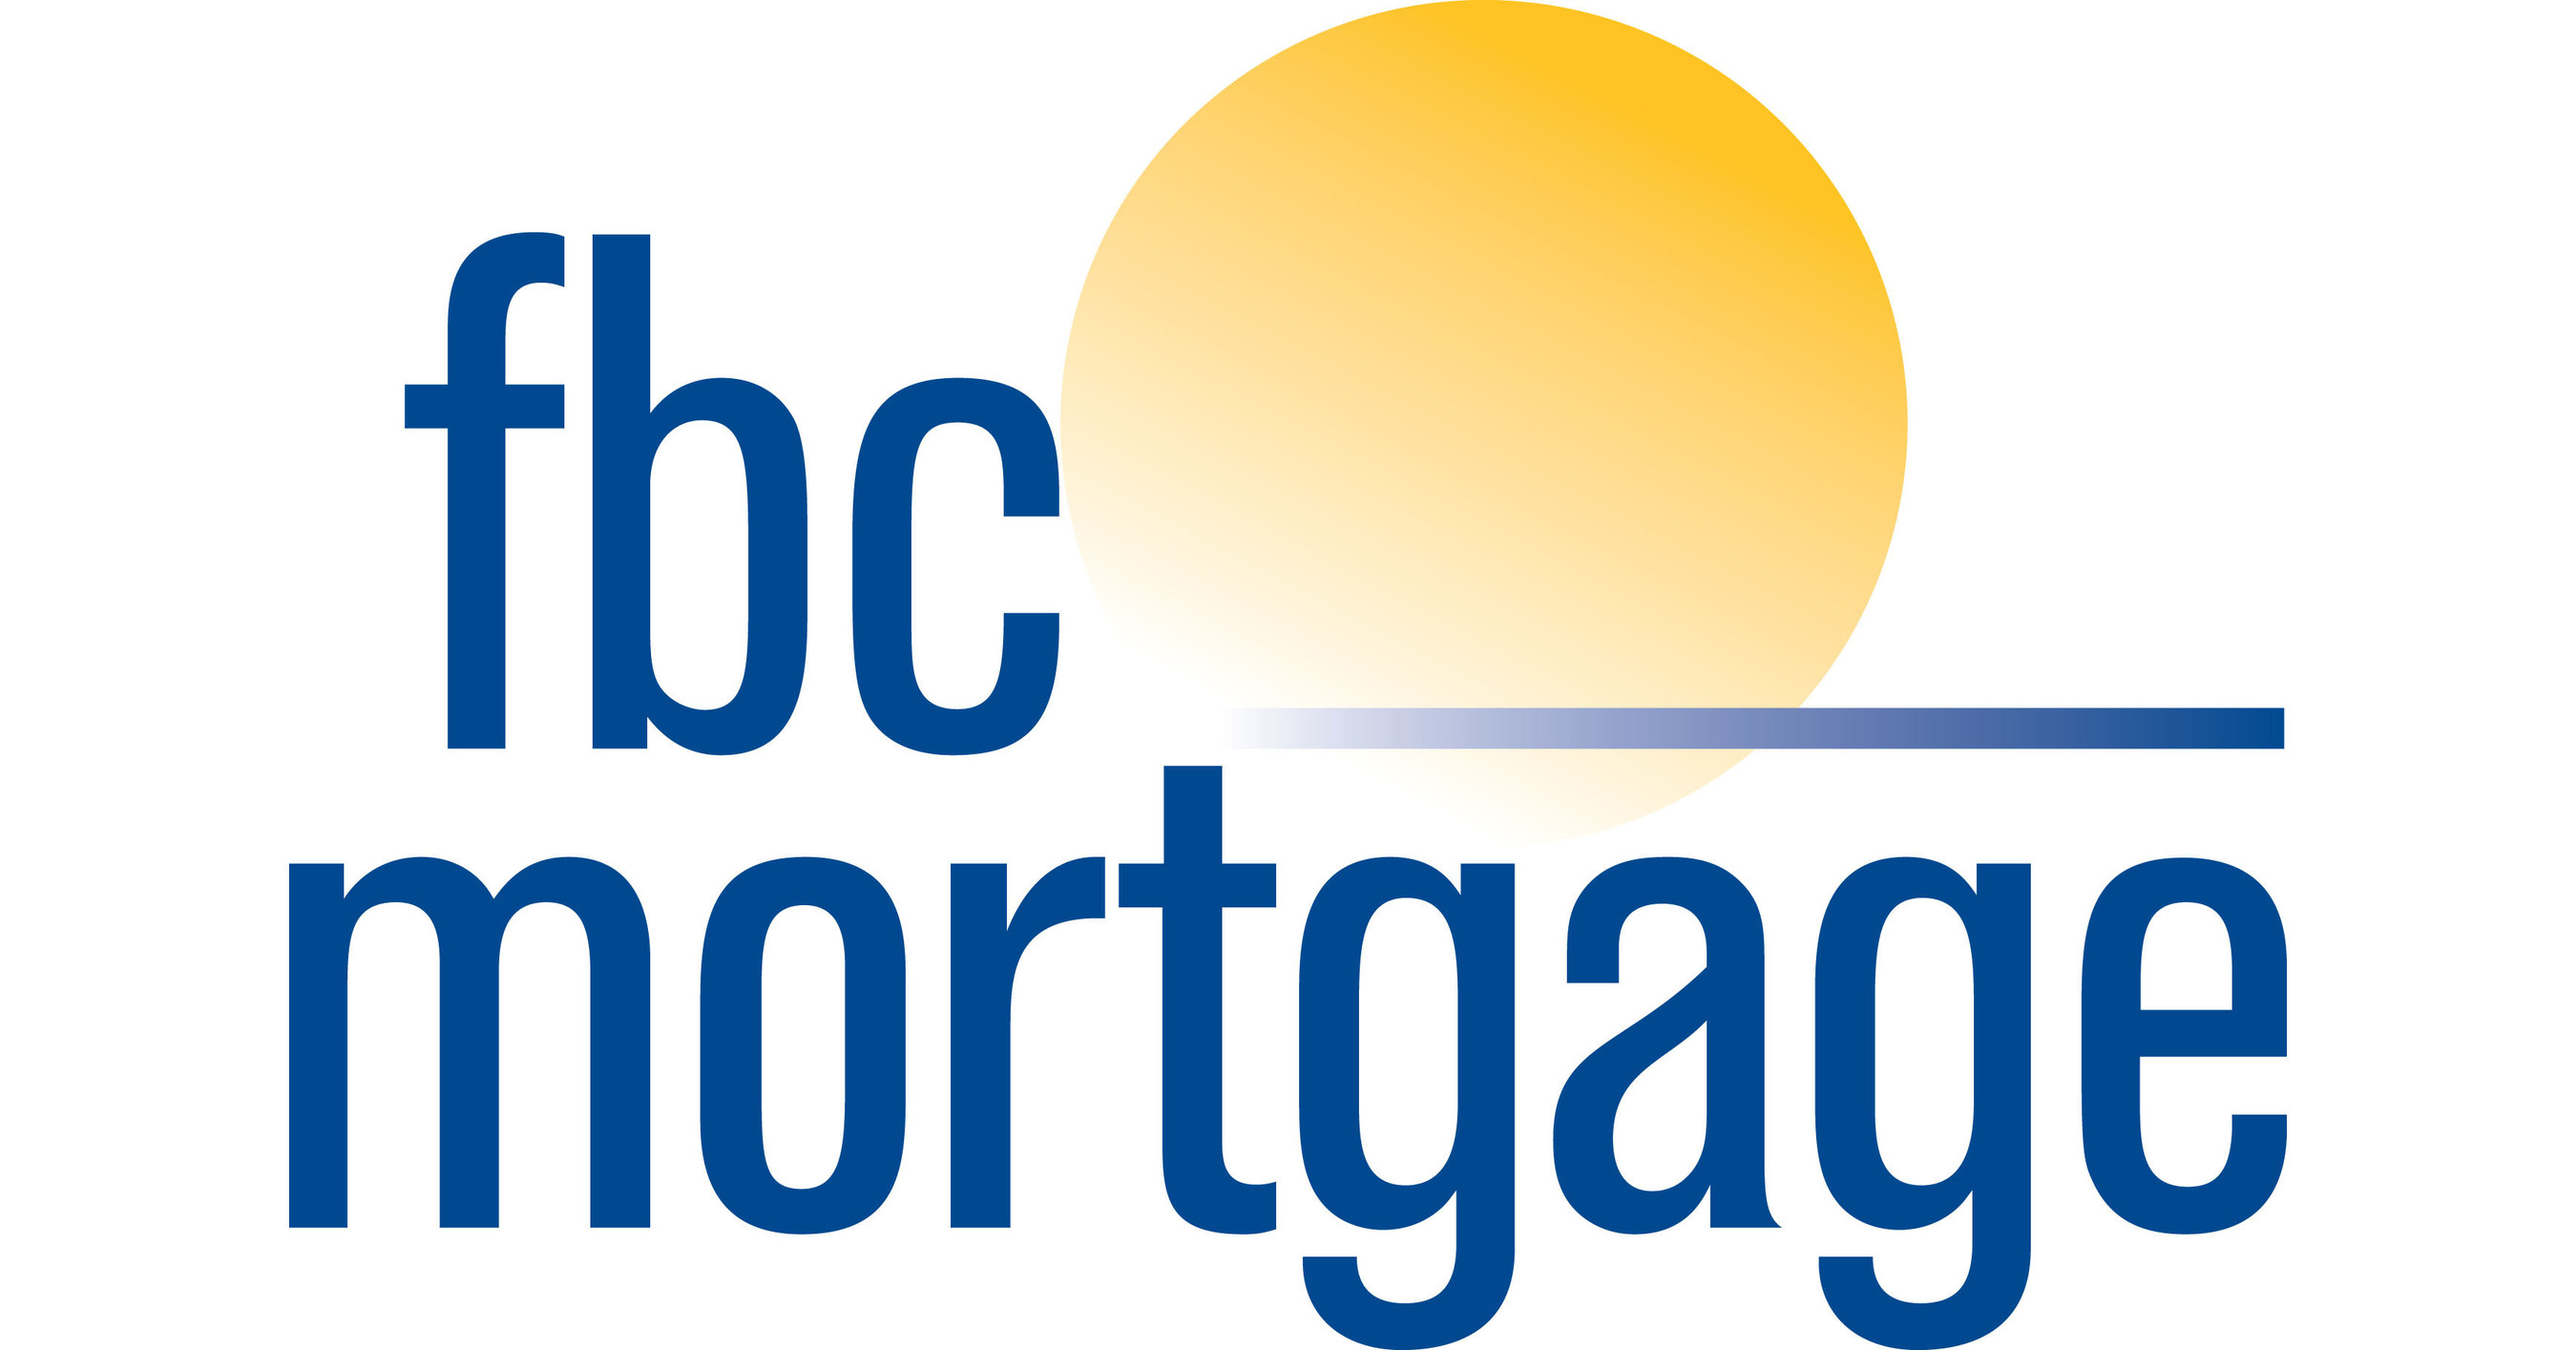 https://mma.prnewswire.com/media/529983/FBC_Mortgage_Logo.jpg?p=facebook Fbc